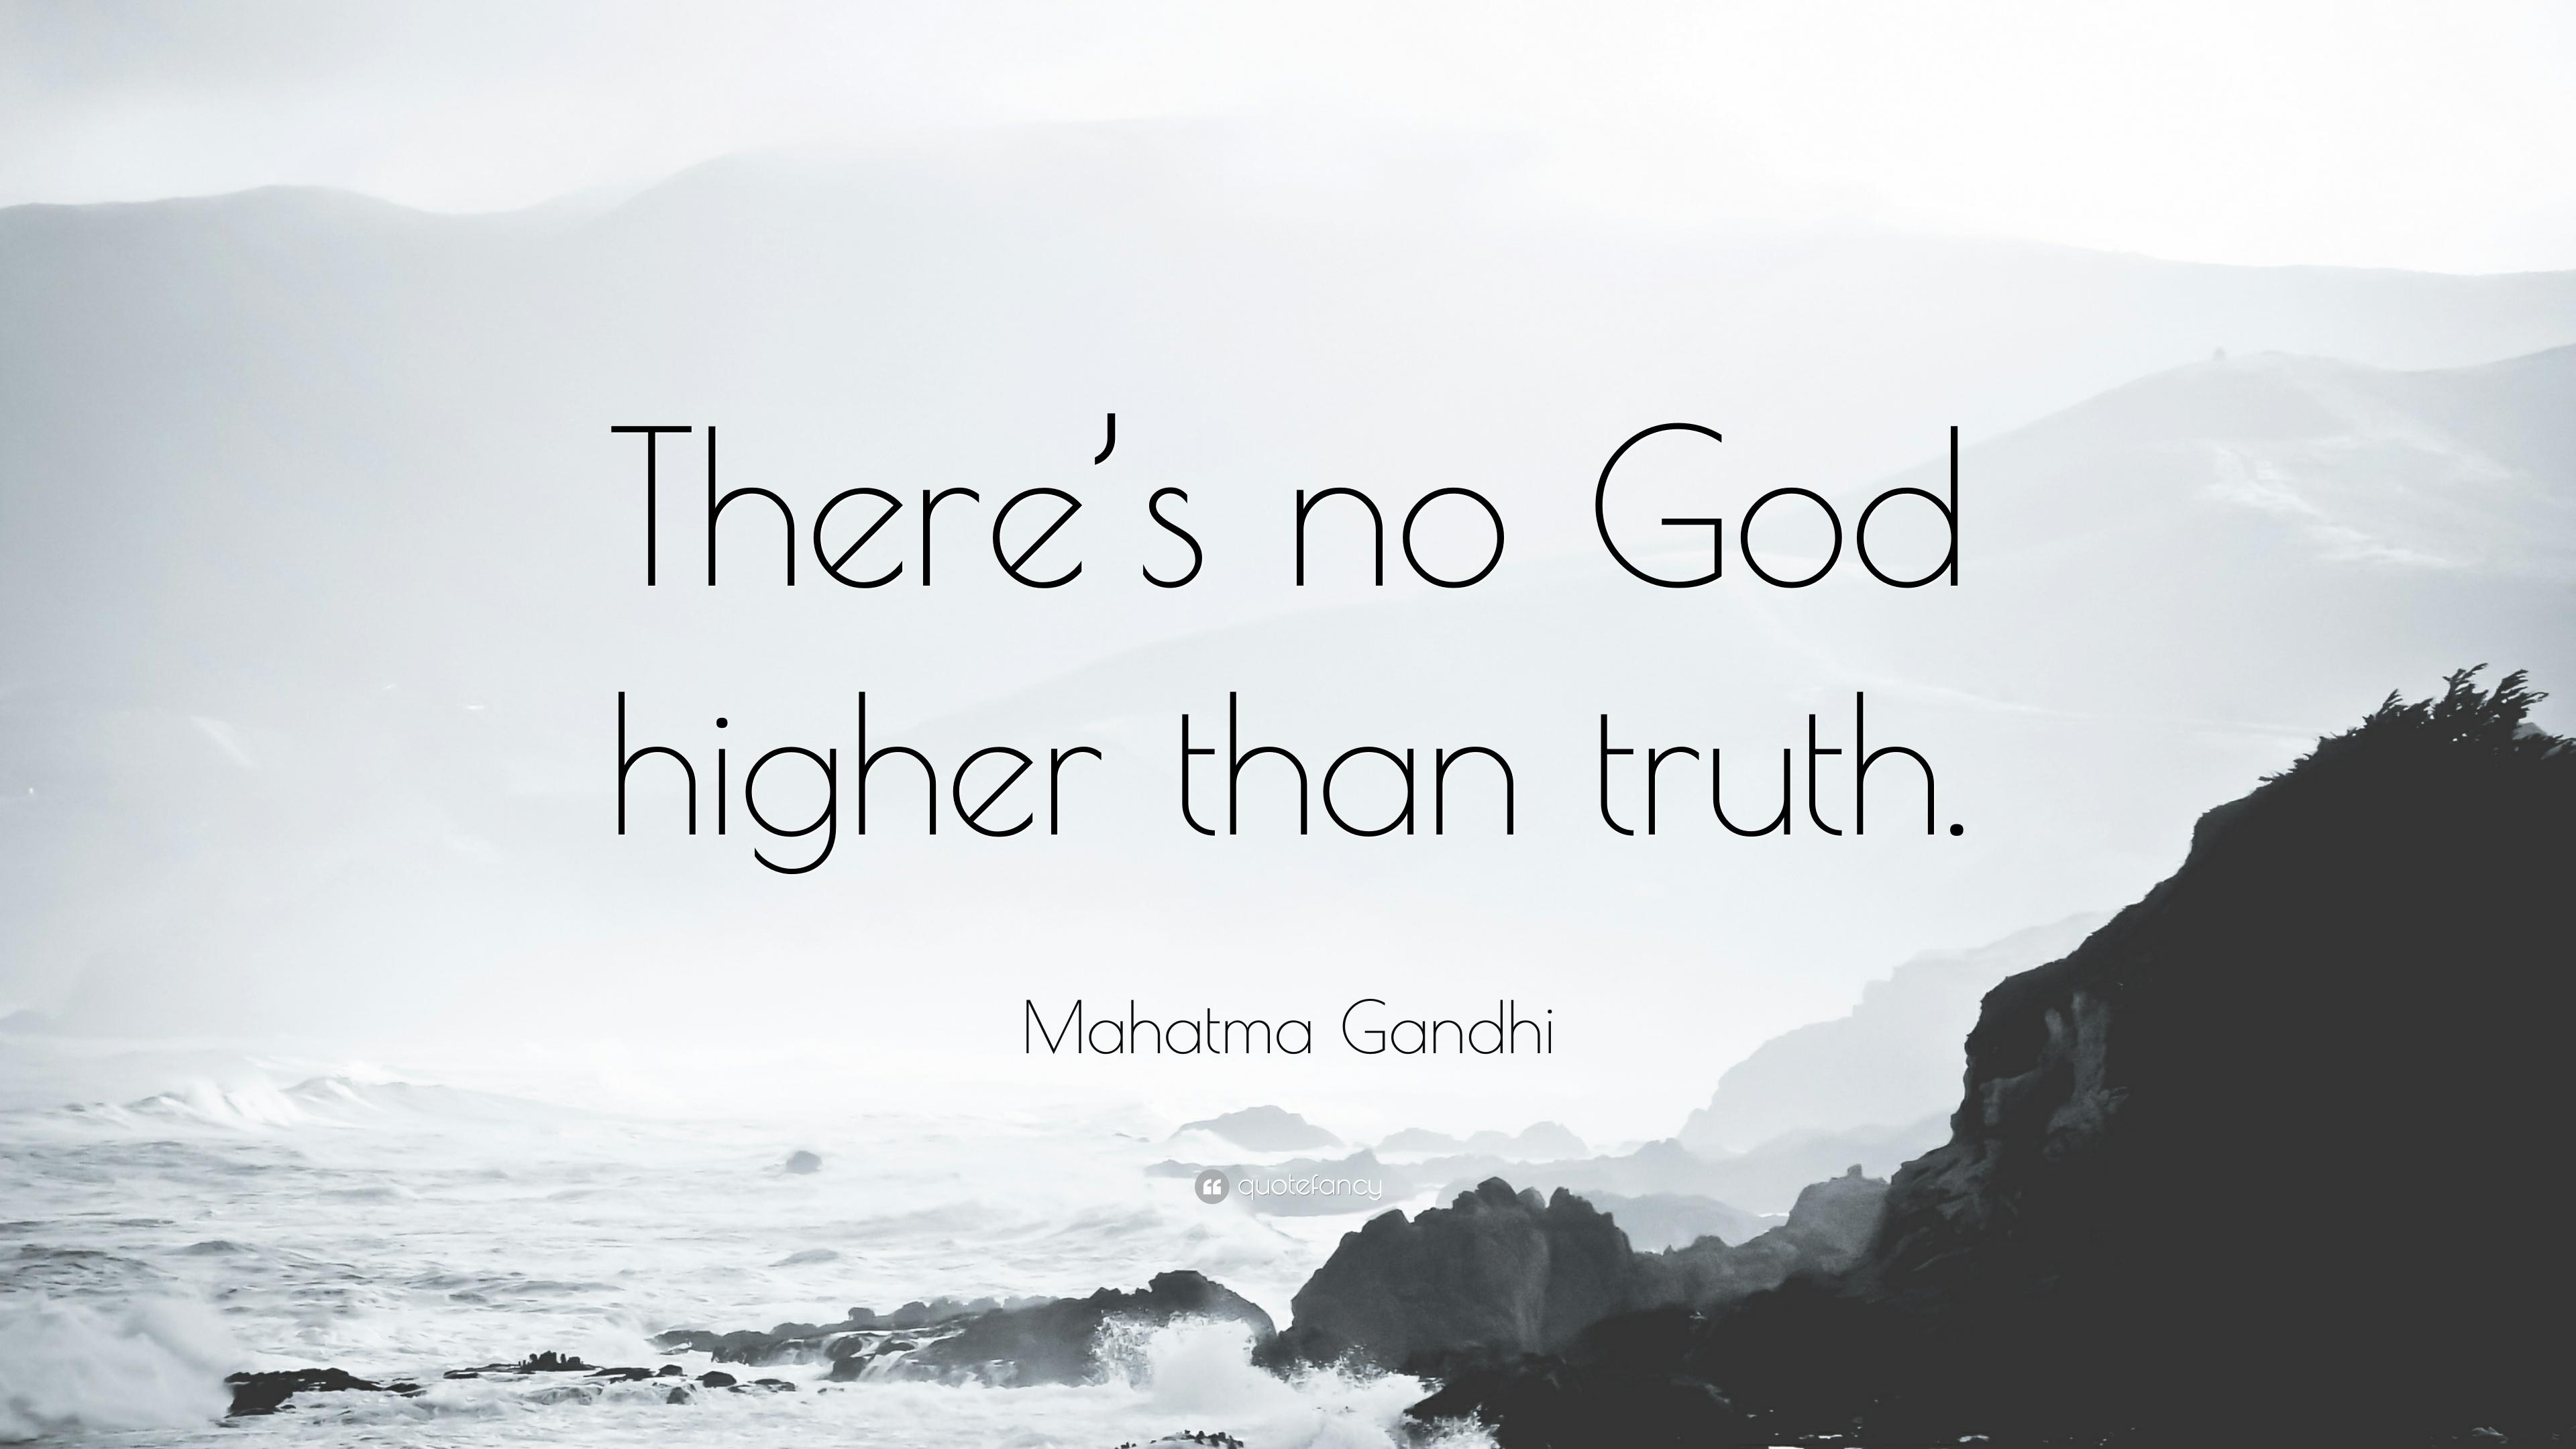 GANDHI SAID